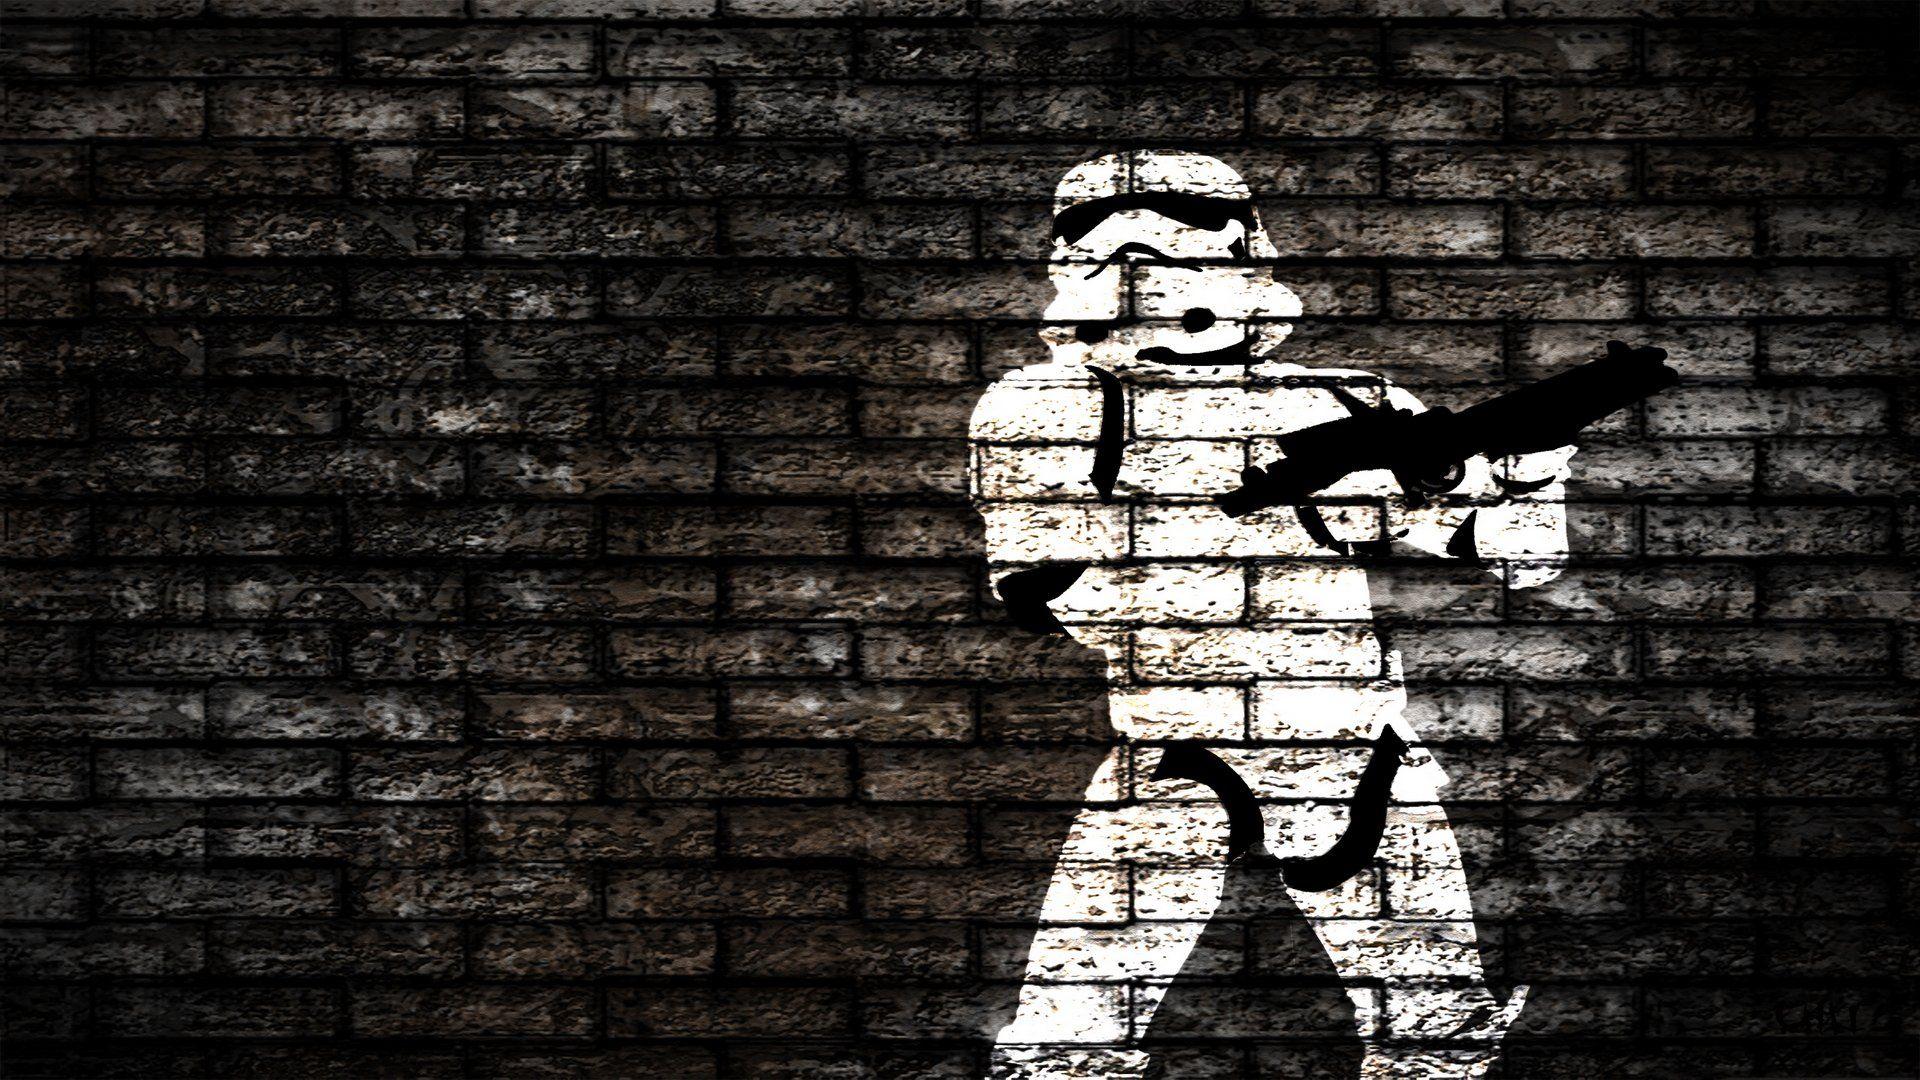 Star Wars Stormtrooper Wallpaper